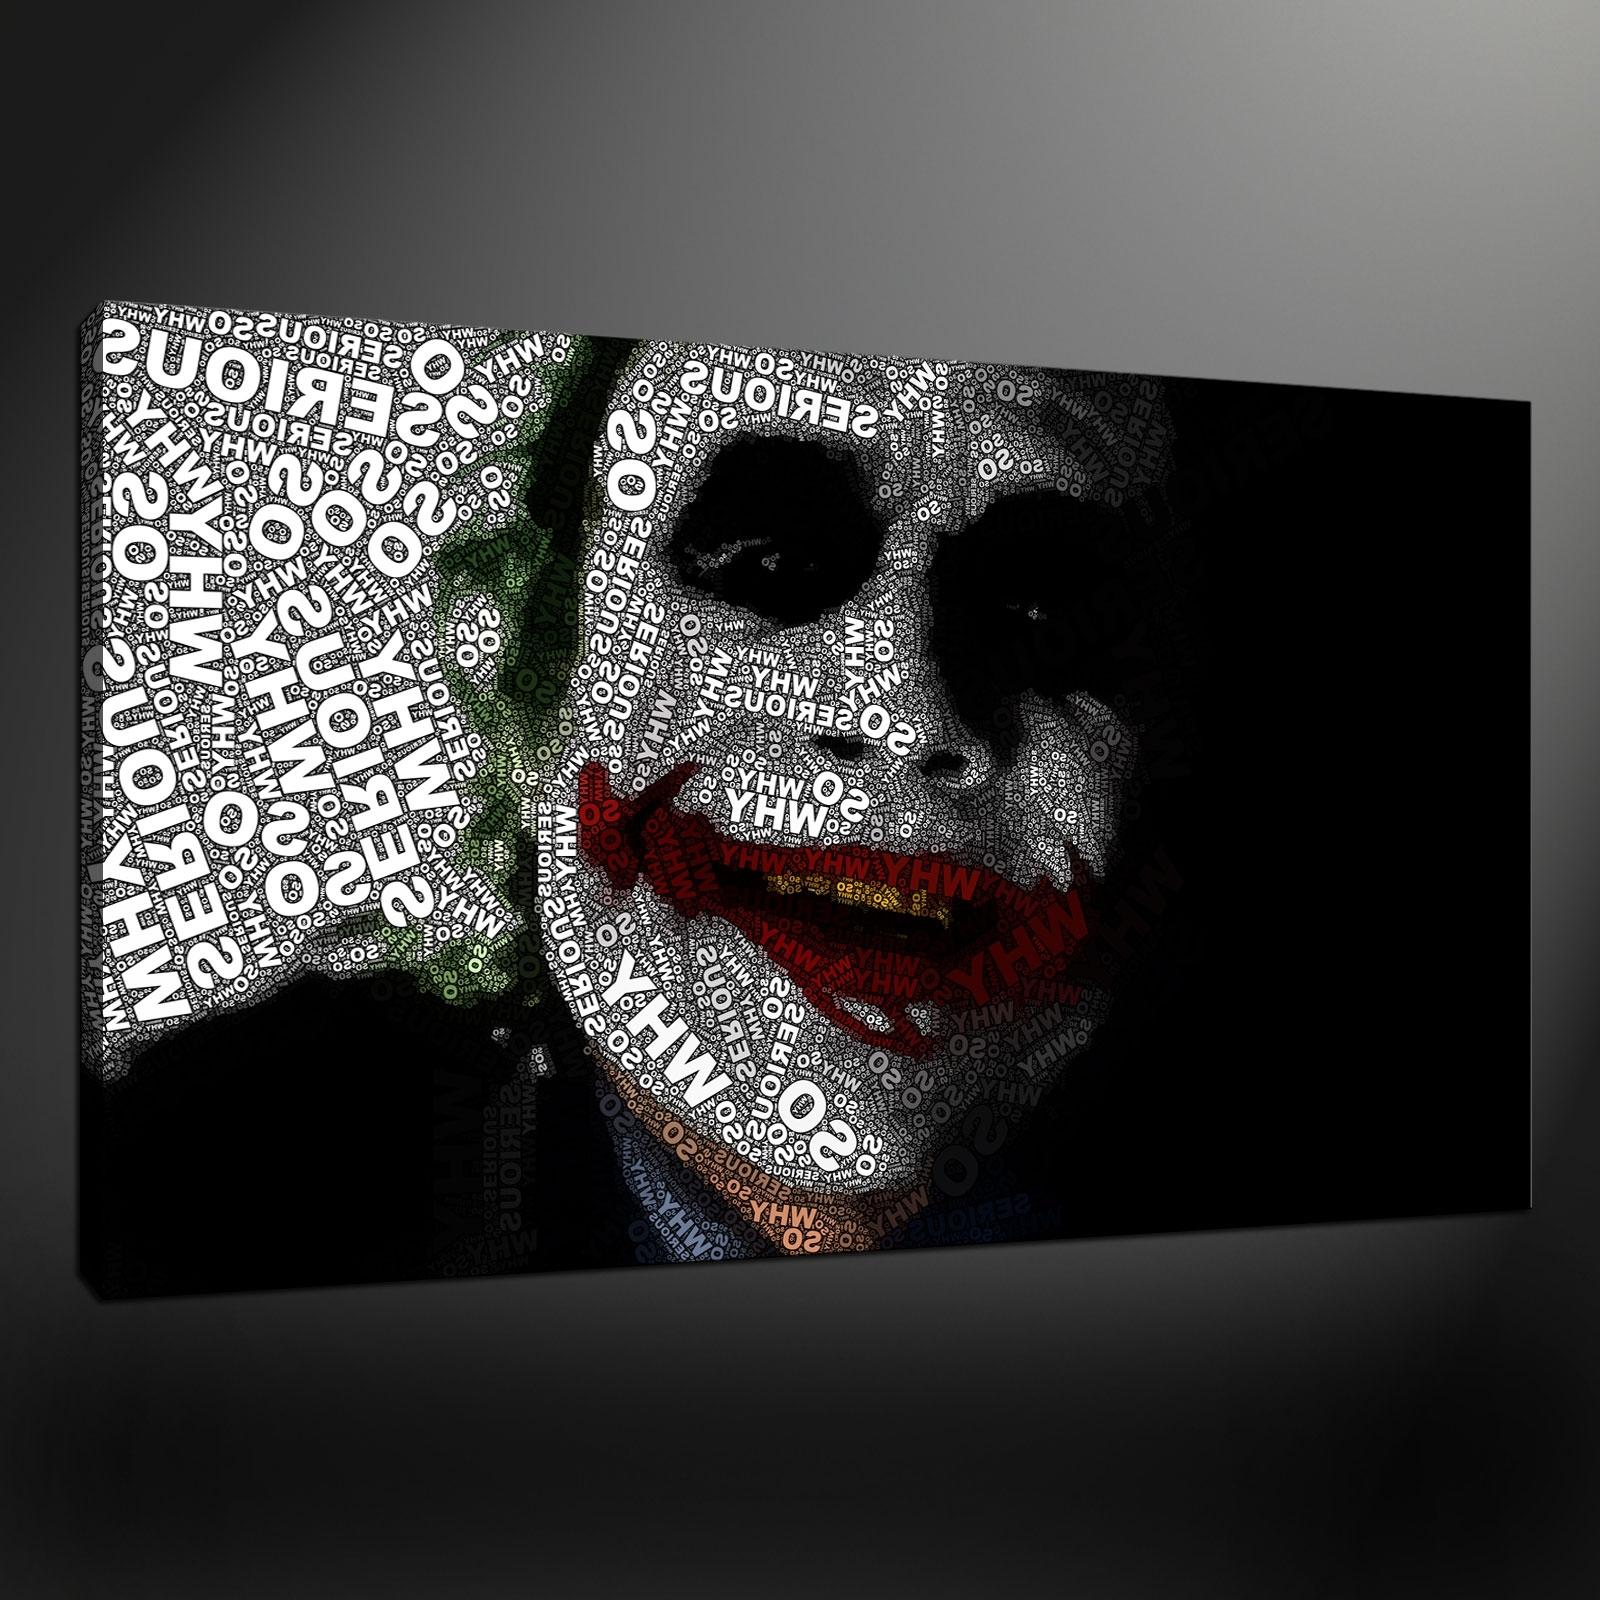 Well Known Quality Canvas Print Art Regarding Joker Canvas Wall Art (View 6 of 15)